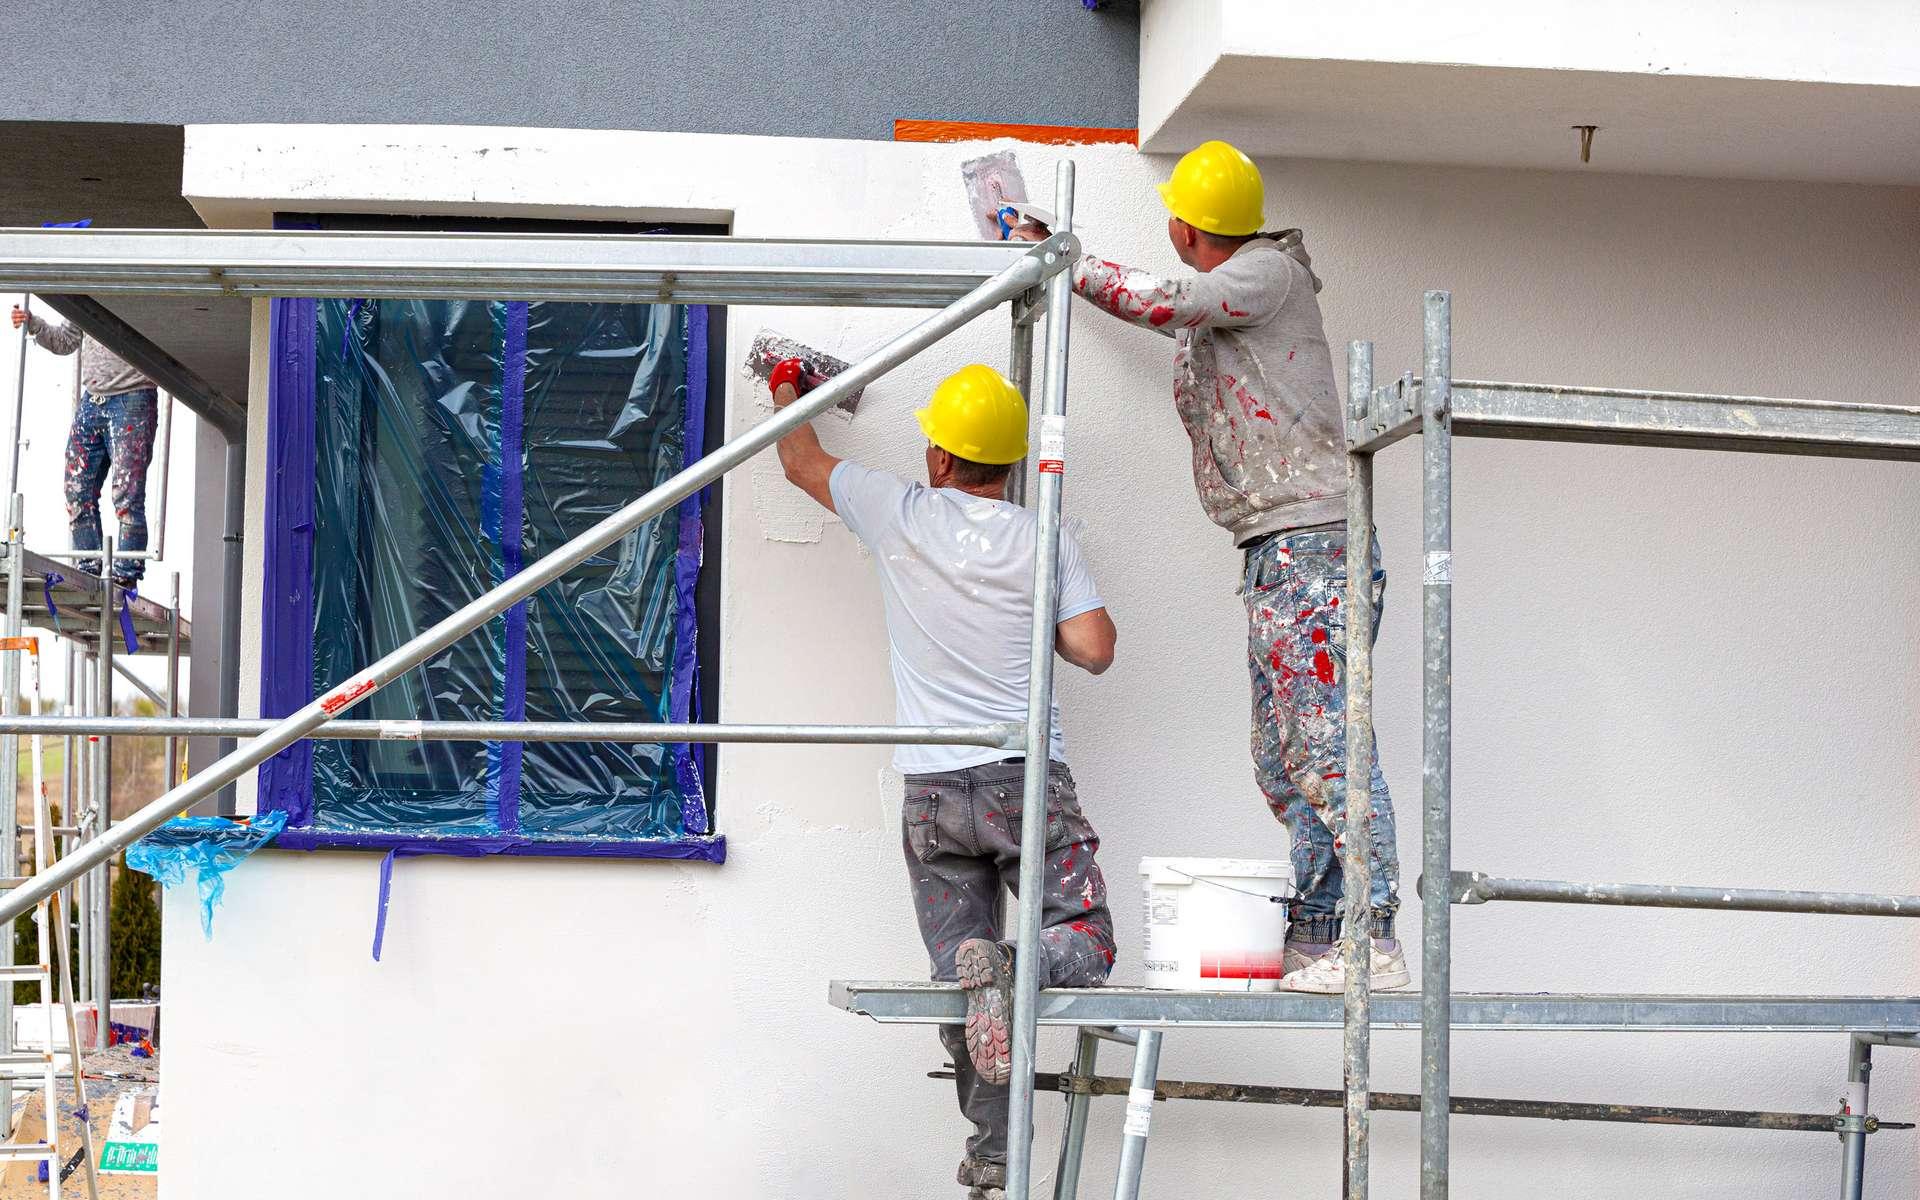 Quel est le prix d'un ravalement de façade ? - © Adobe Stock, Dagmara_K